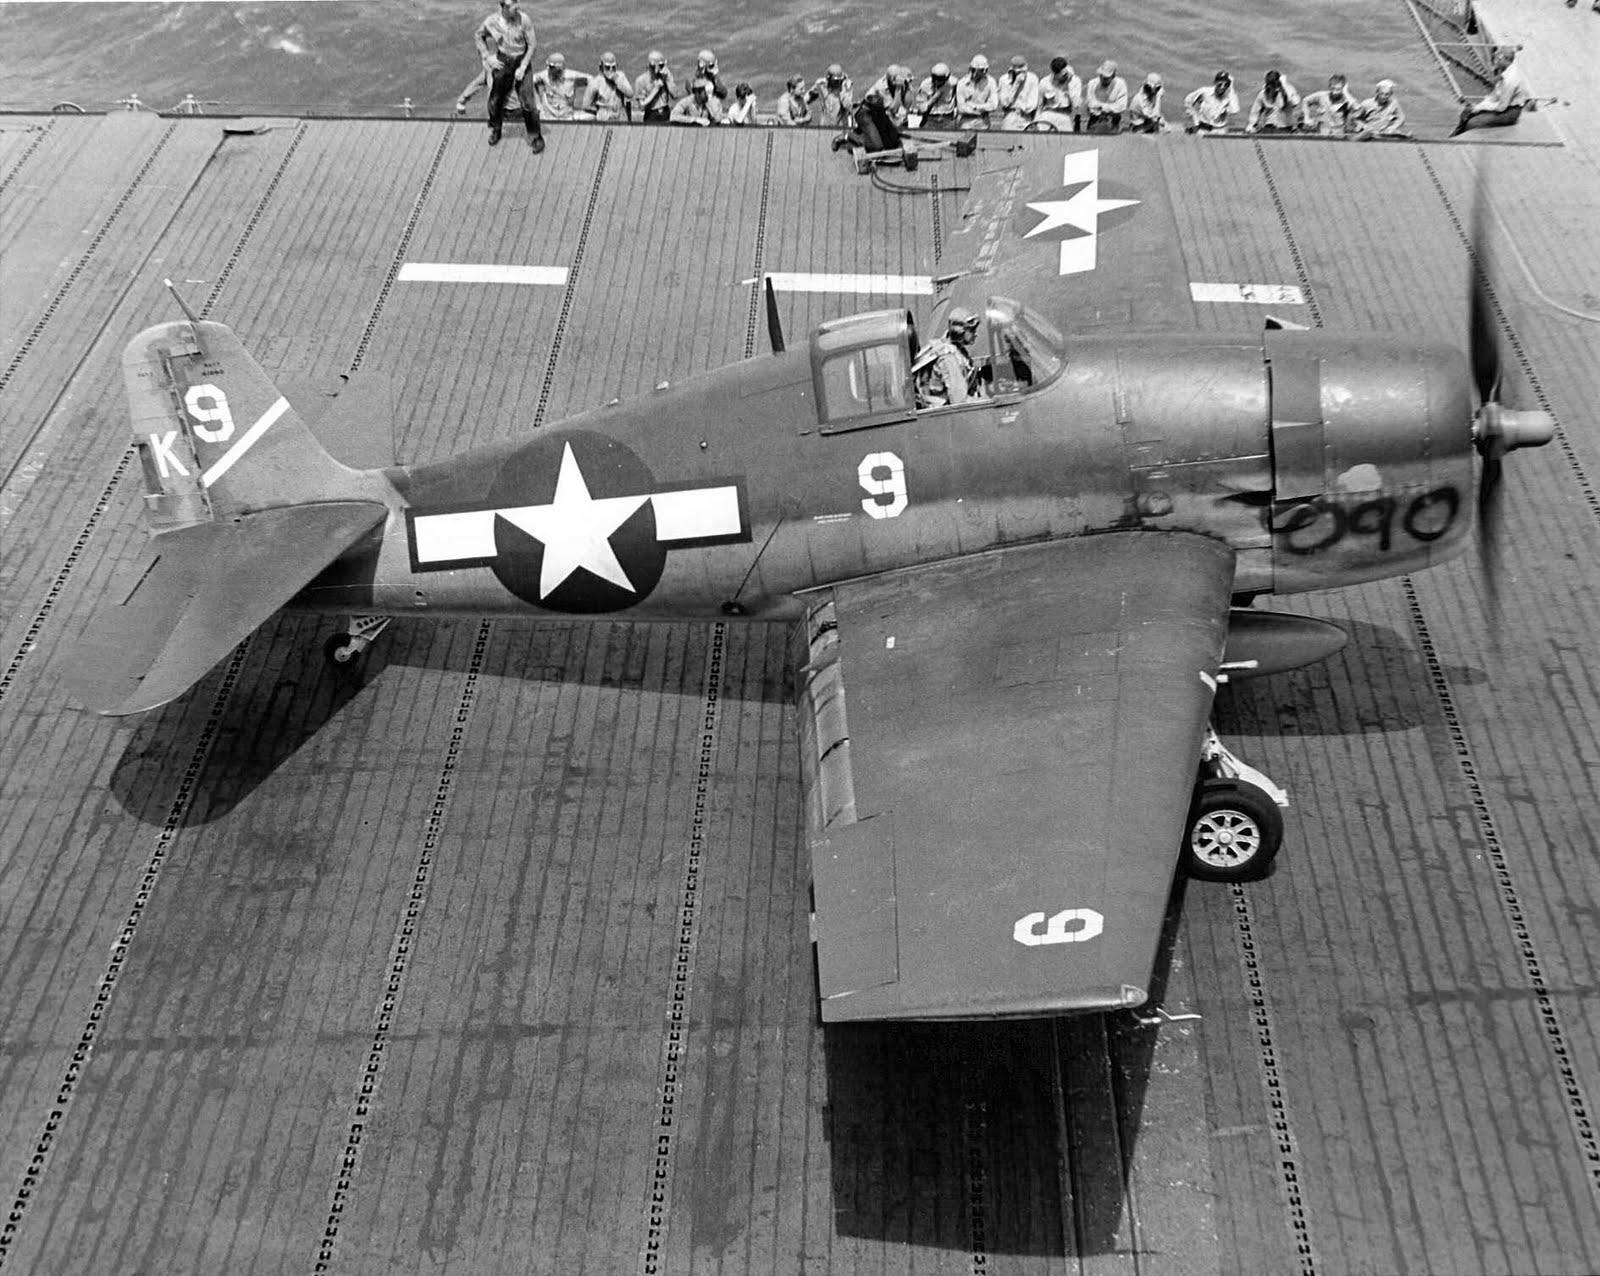 Grumman F6F 3 Hellcat VF 1 White K9 William Moseley BuNo 40090 CV 10 USS Yorktown II 1944 02